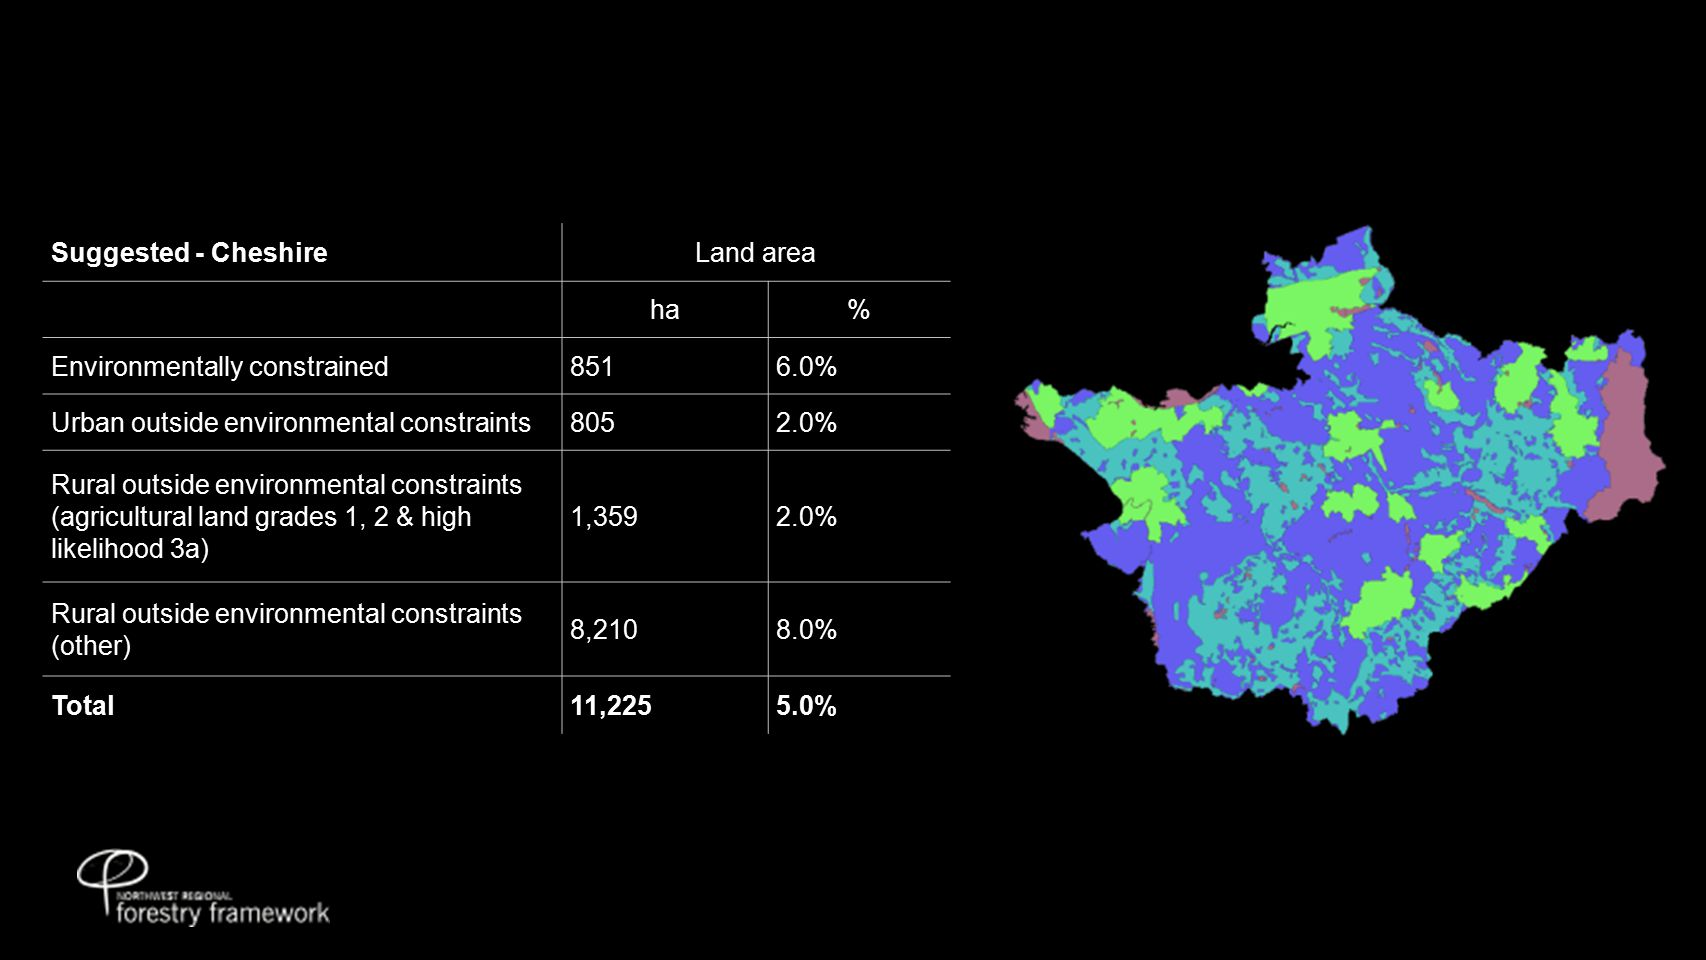 Suggested - CheshireLand area ha% Environmentally constrained8516.0% Urban outside environmental constraints8052.0% Rural outside environmental constraints (agricultural land grades 1, 2 & high likelihood 3a) 1,3592.0% Rural outside environmental constraints (other) 8,2108.0% Total11,2255.0%